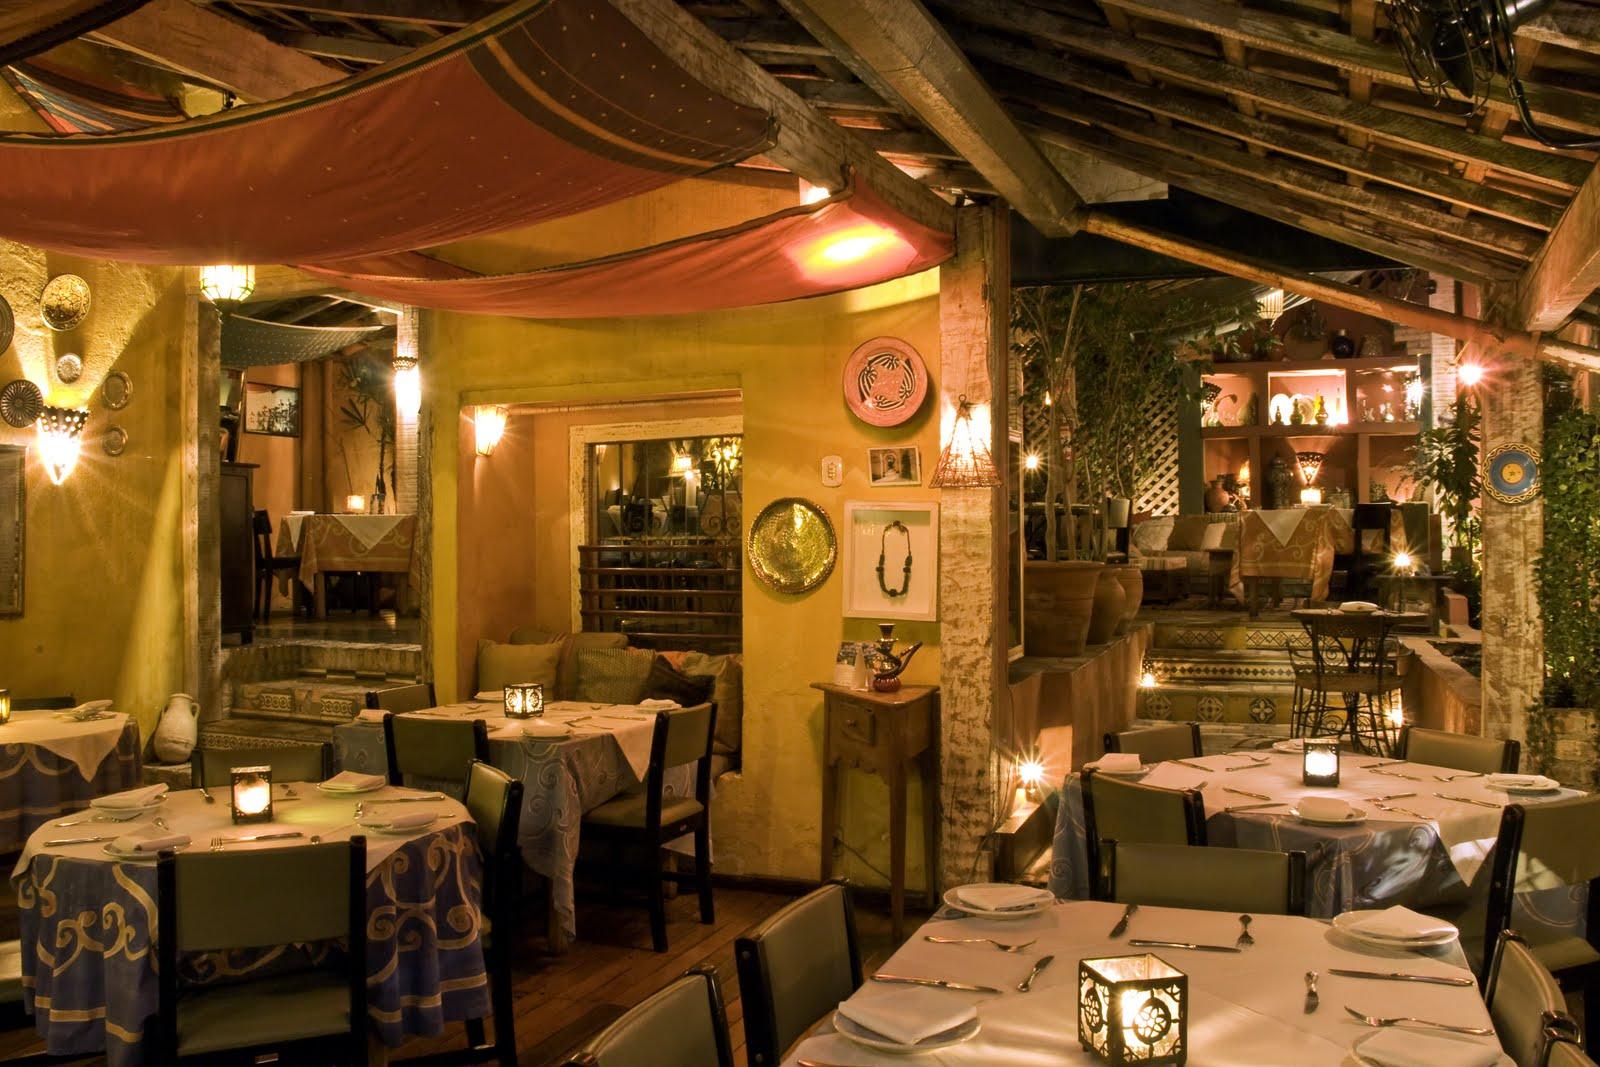 Restaurante marroquino, Tanger